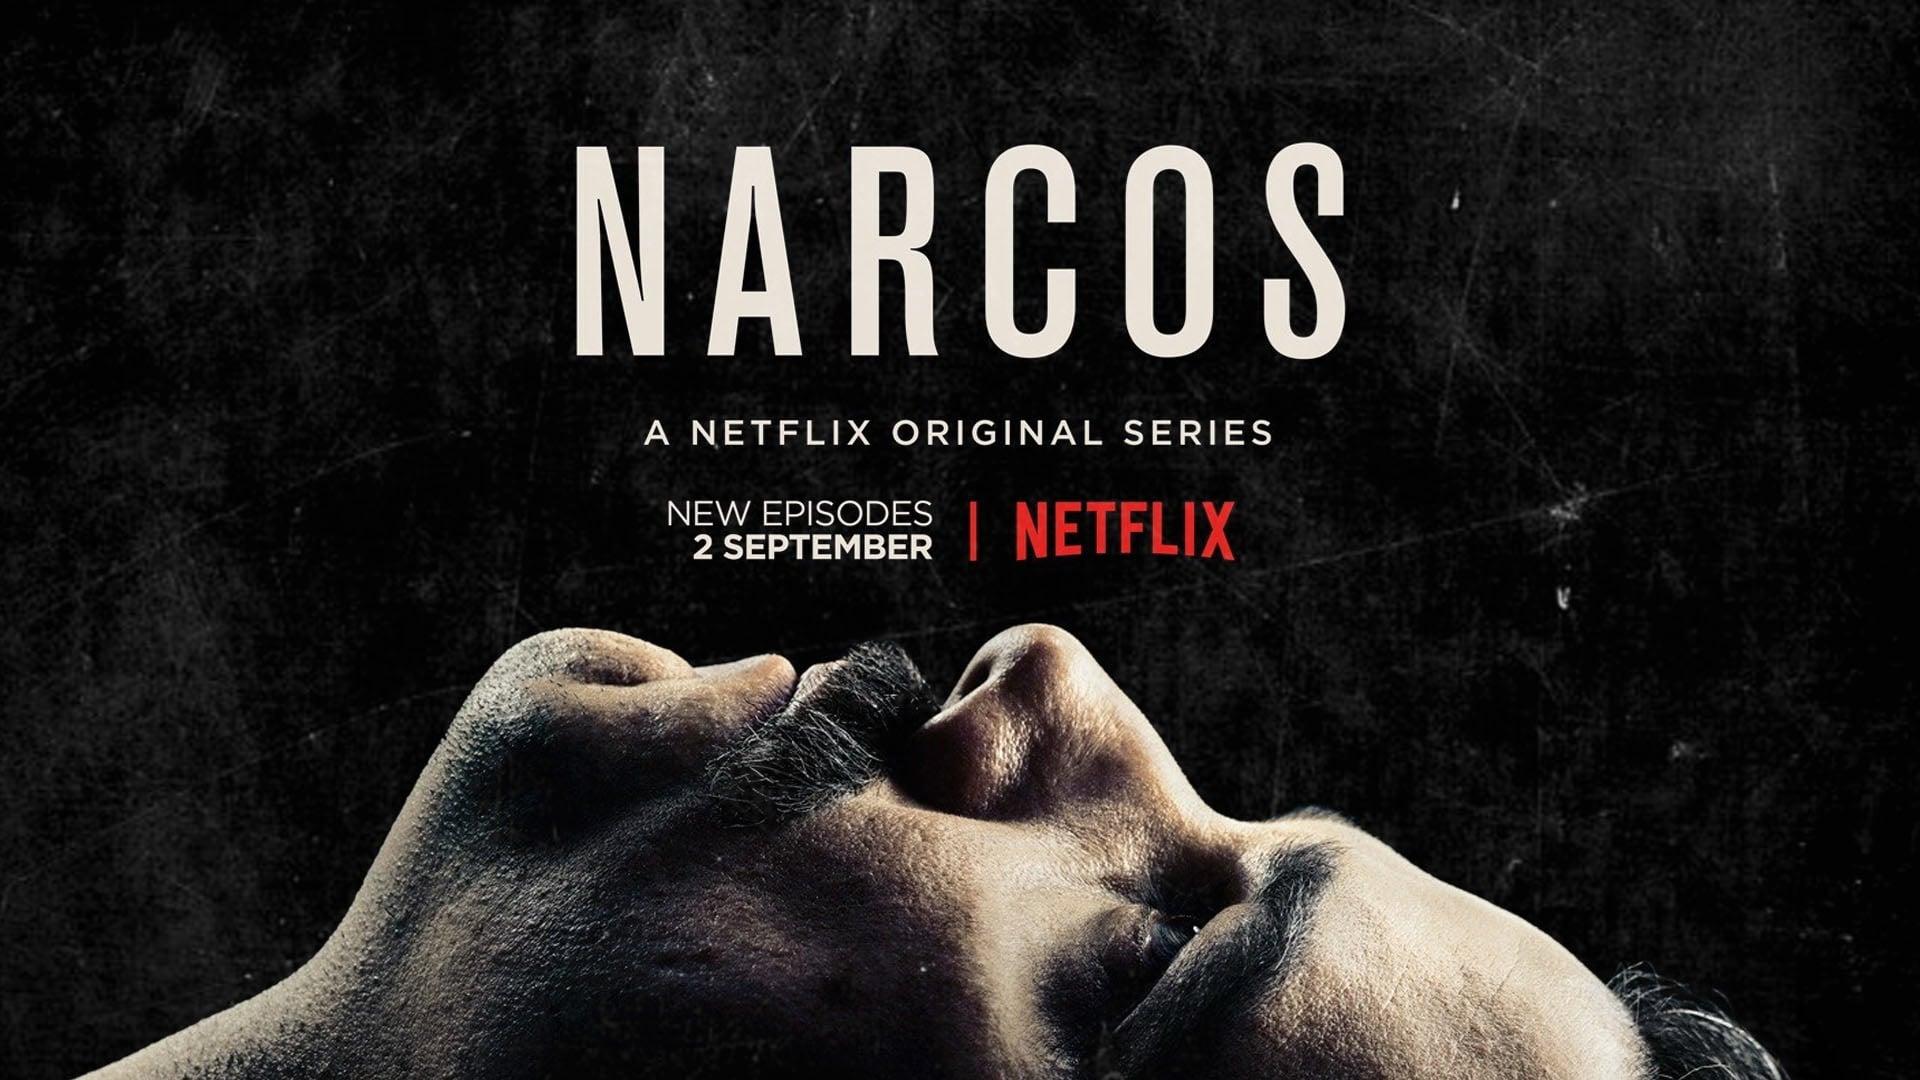 NARCOS Season II Promo